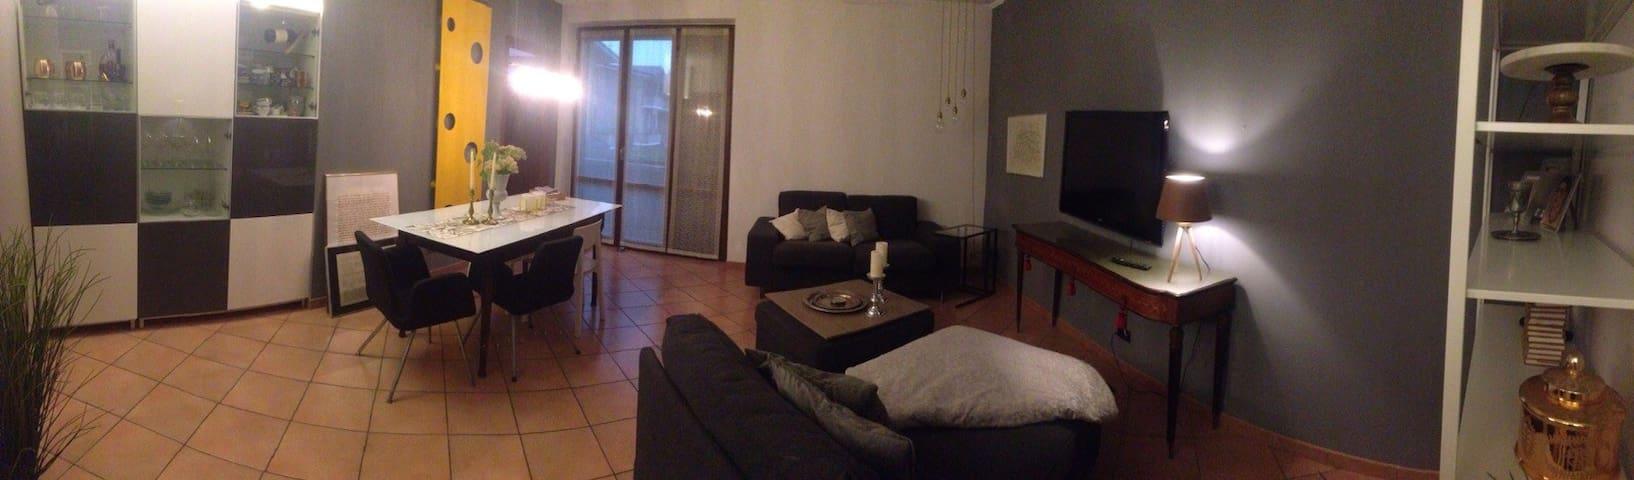 Favolosa e spaziosa casa - Seveso - Leilighet